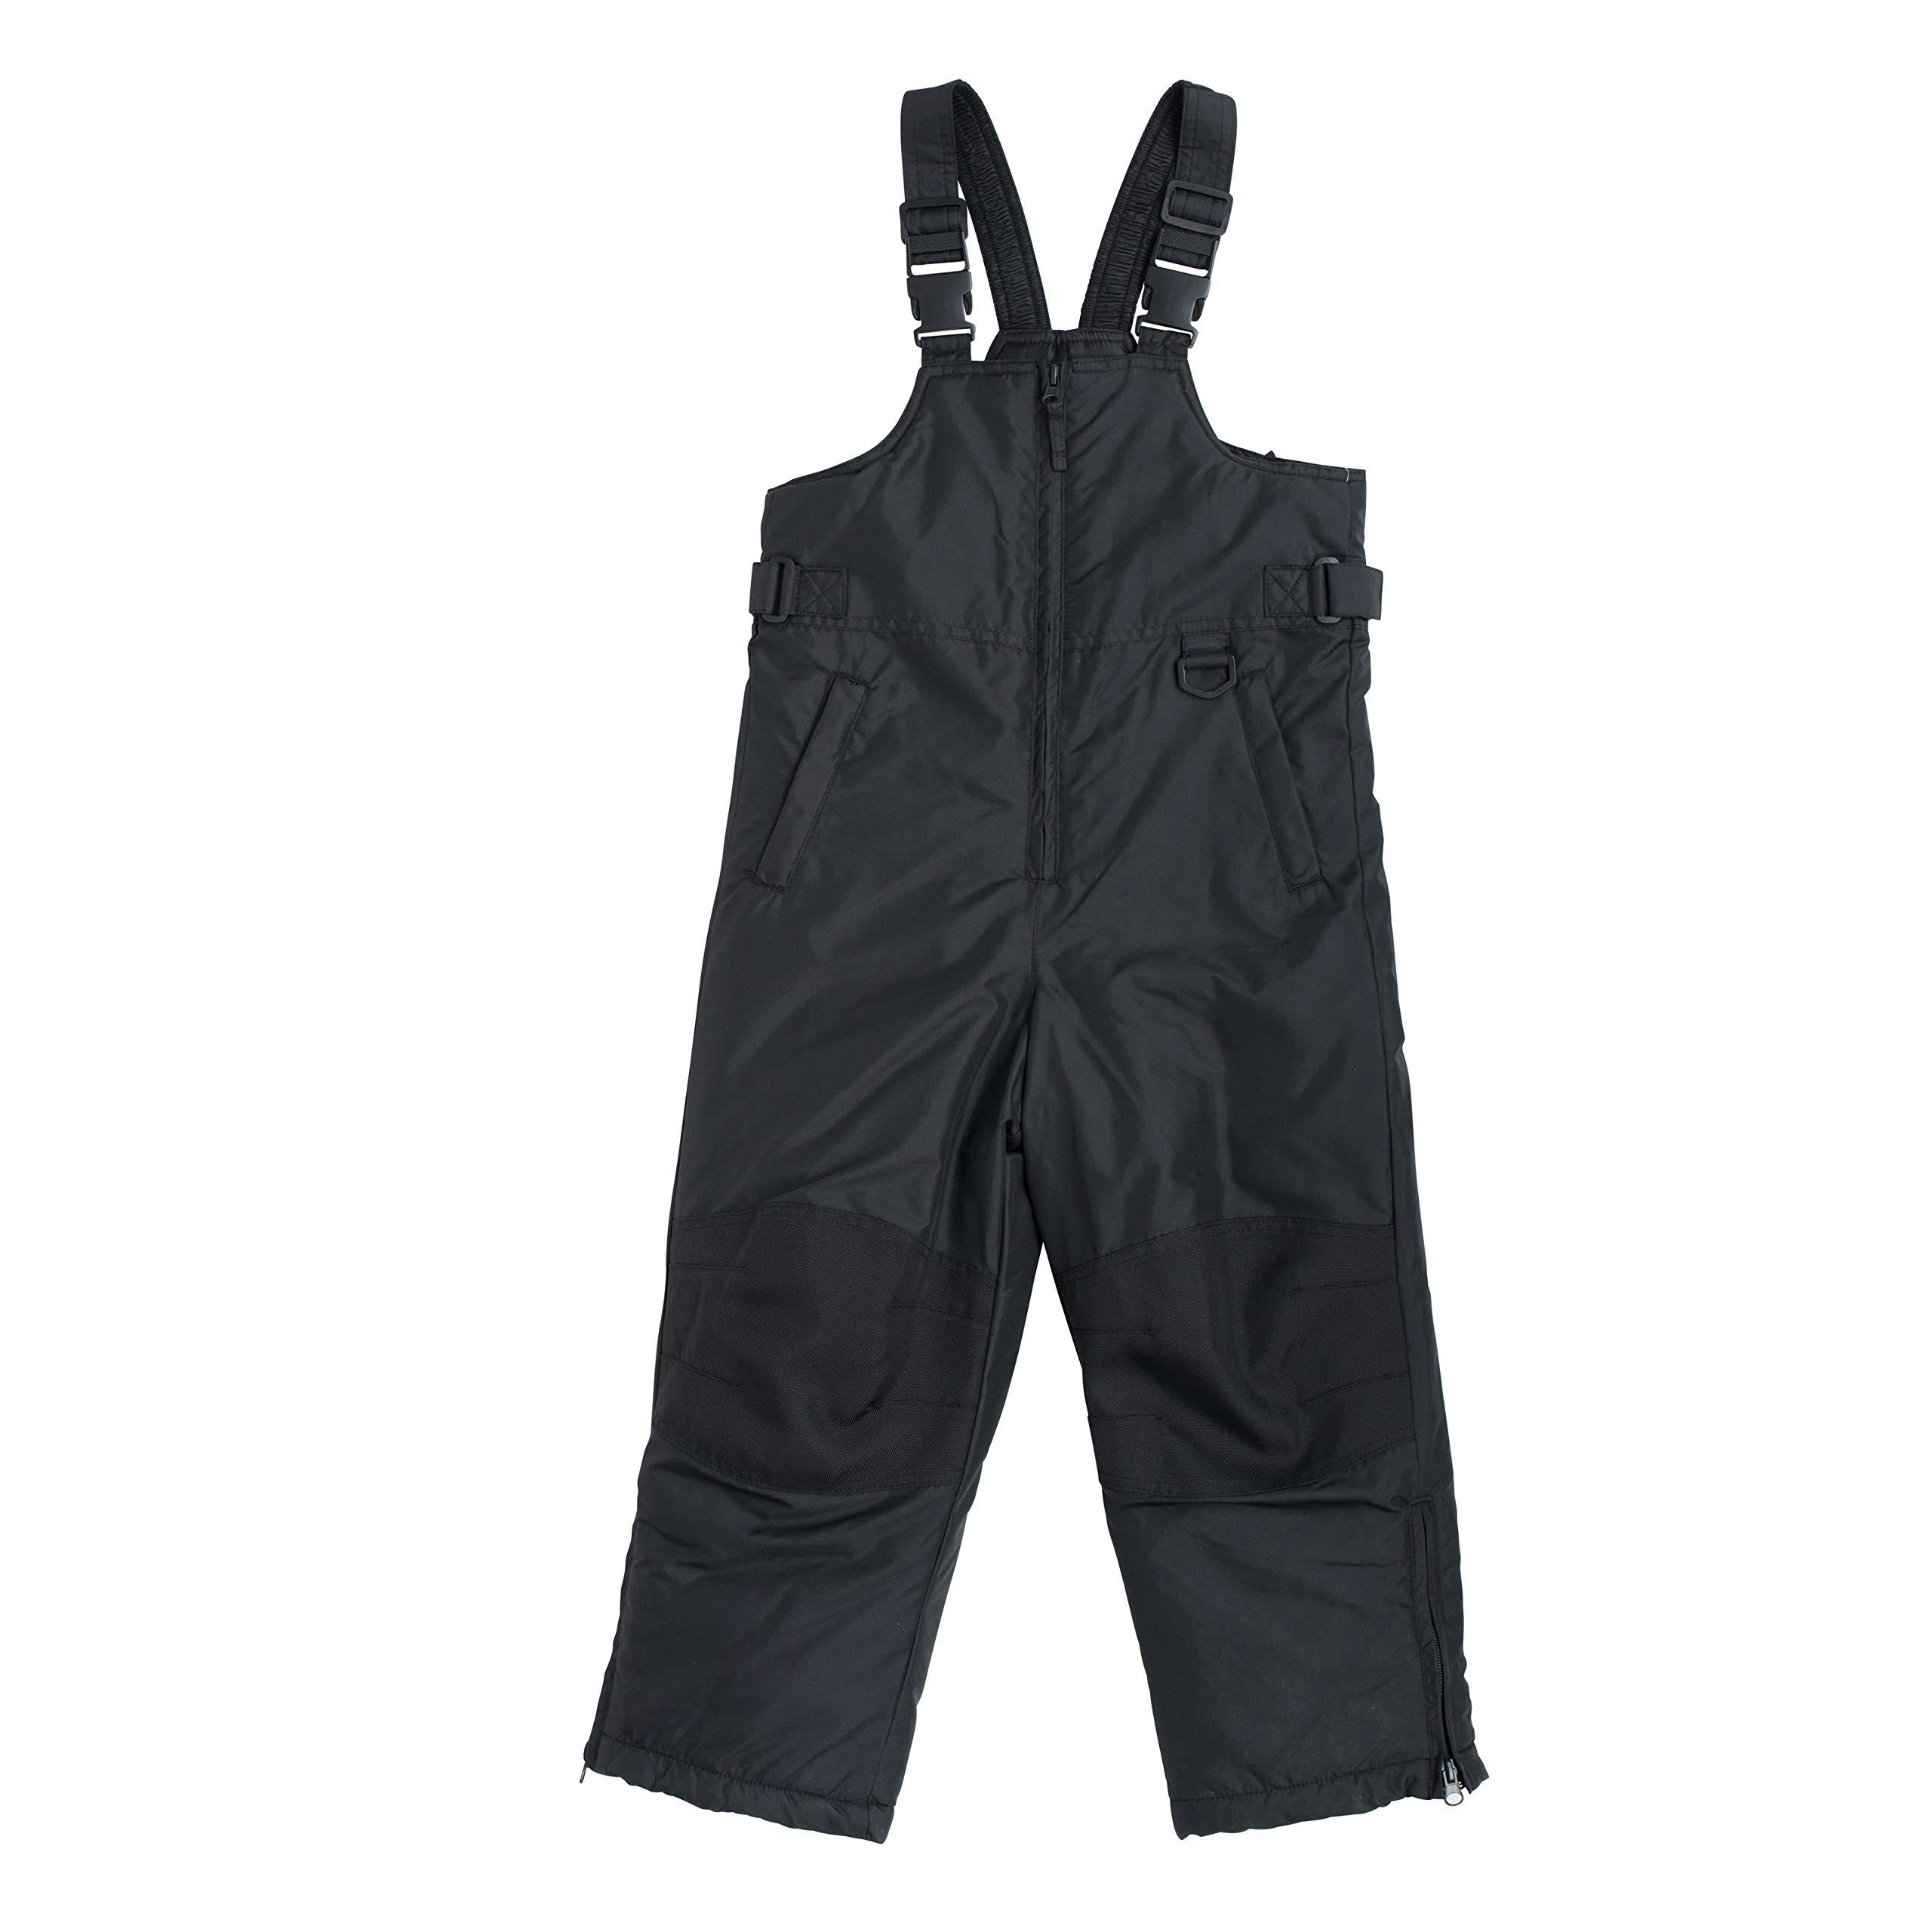 Snowsuits for Kids Husky Insulated Bib Snow Pants Black (12-14 Husky)